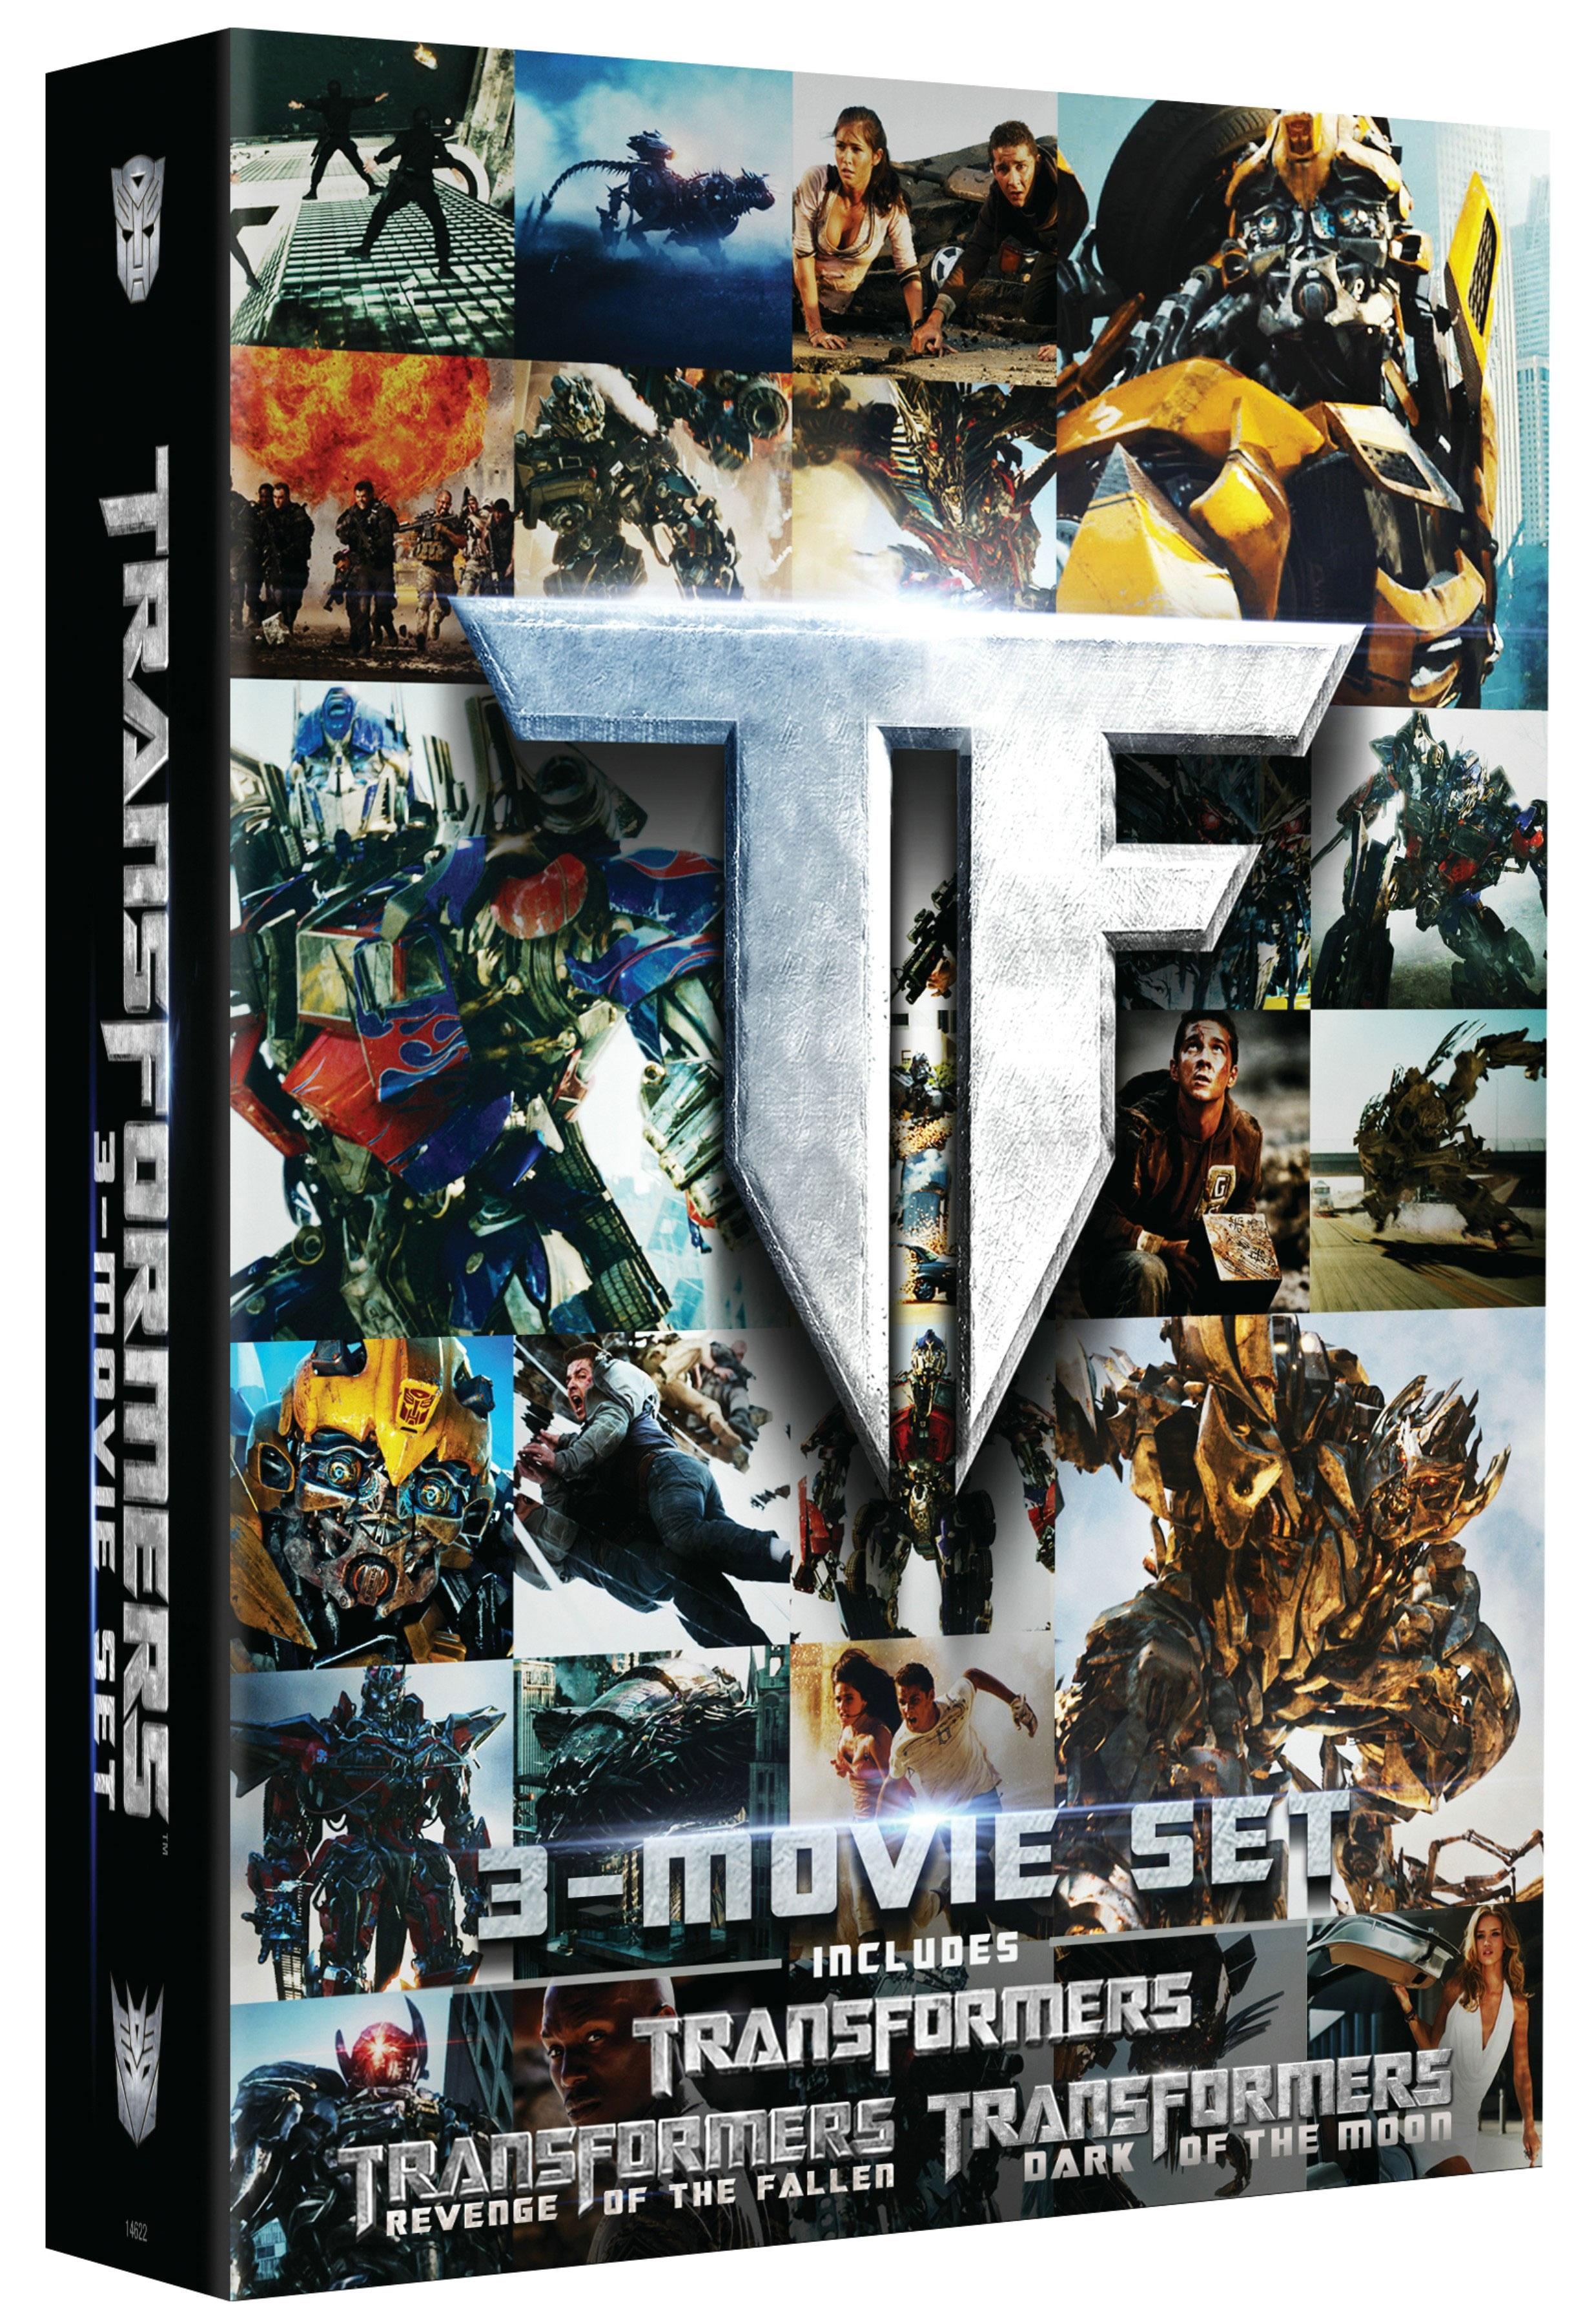 Transformers Trilogy Gift Set (DVD)